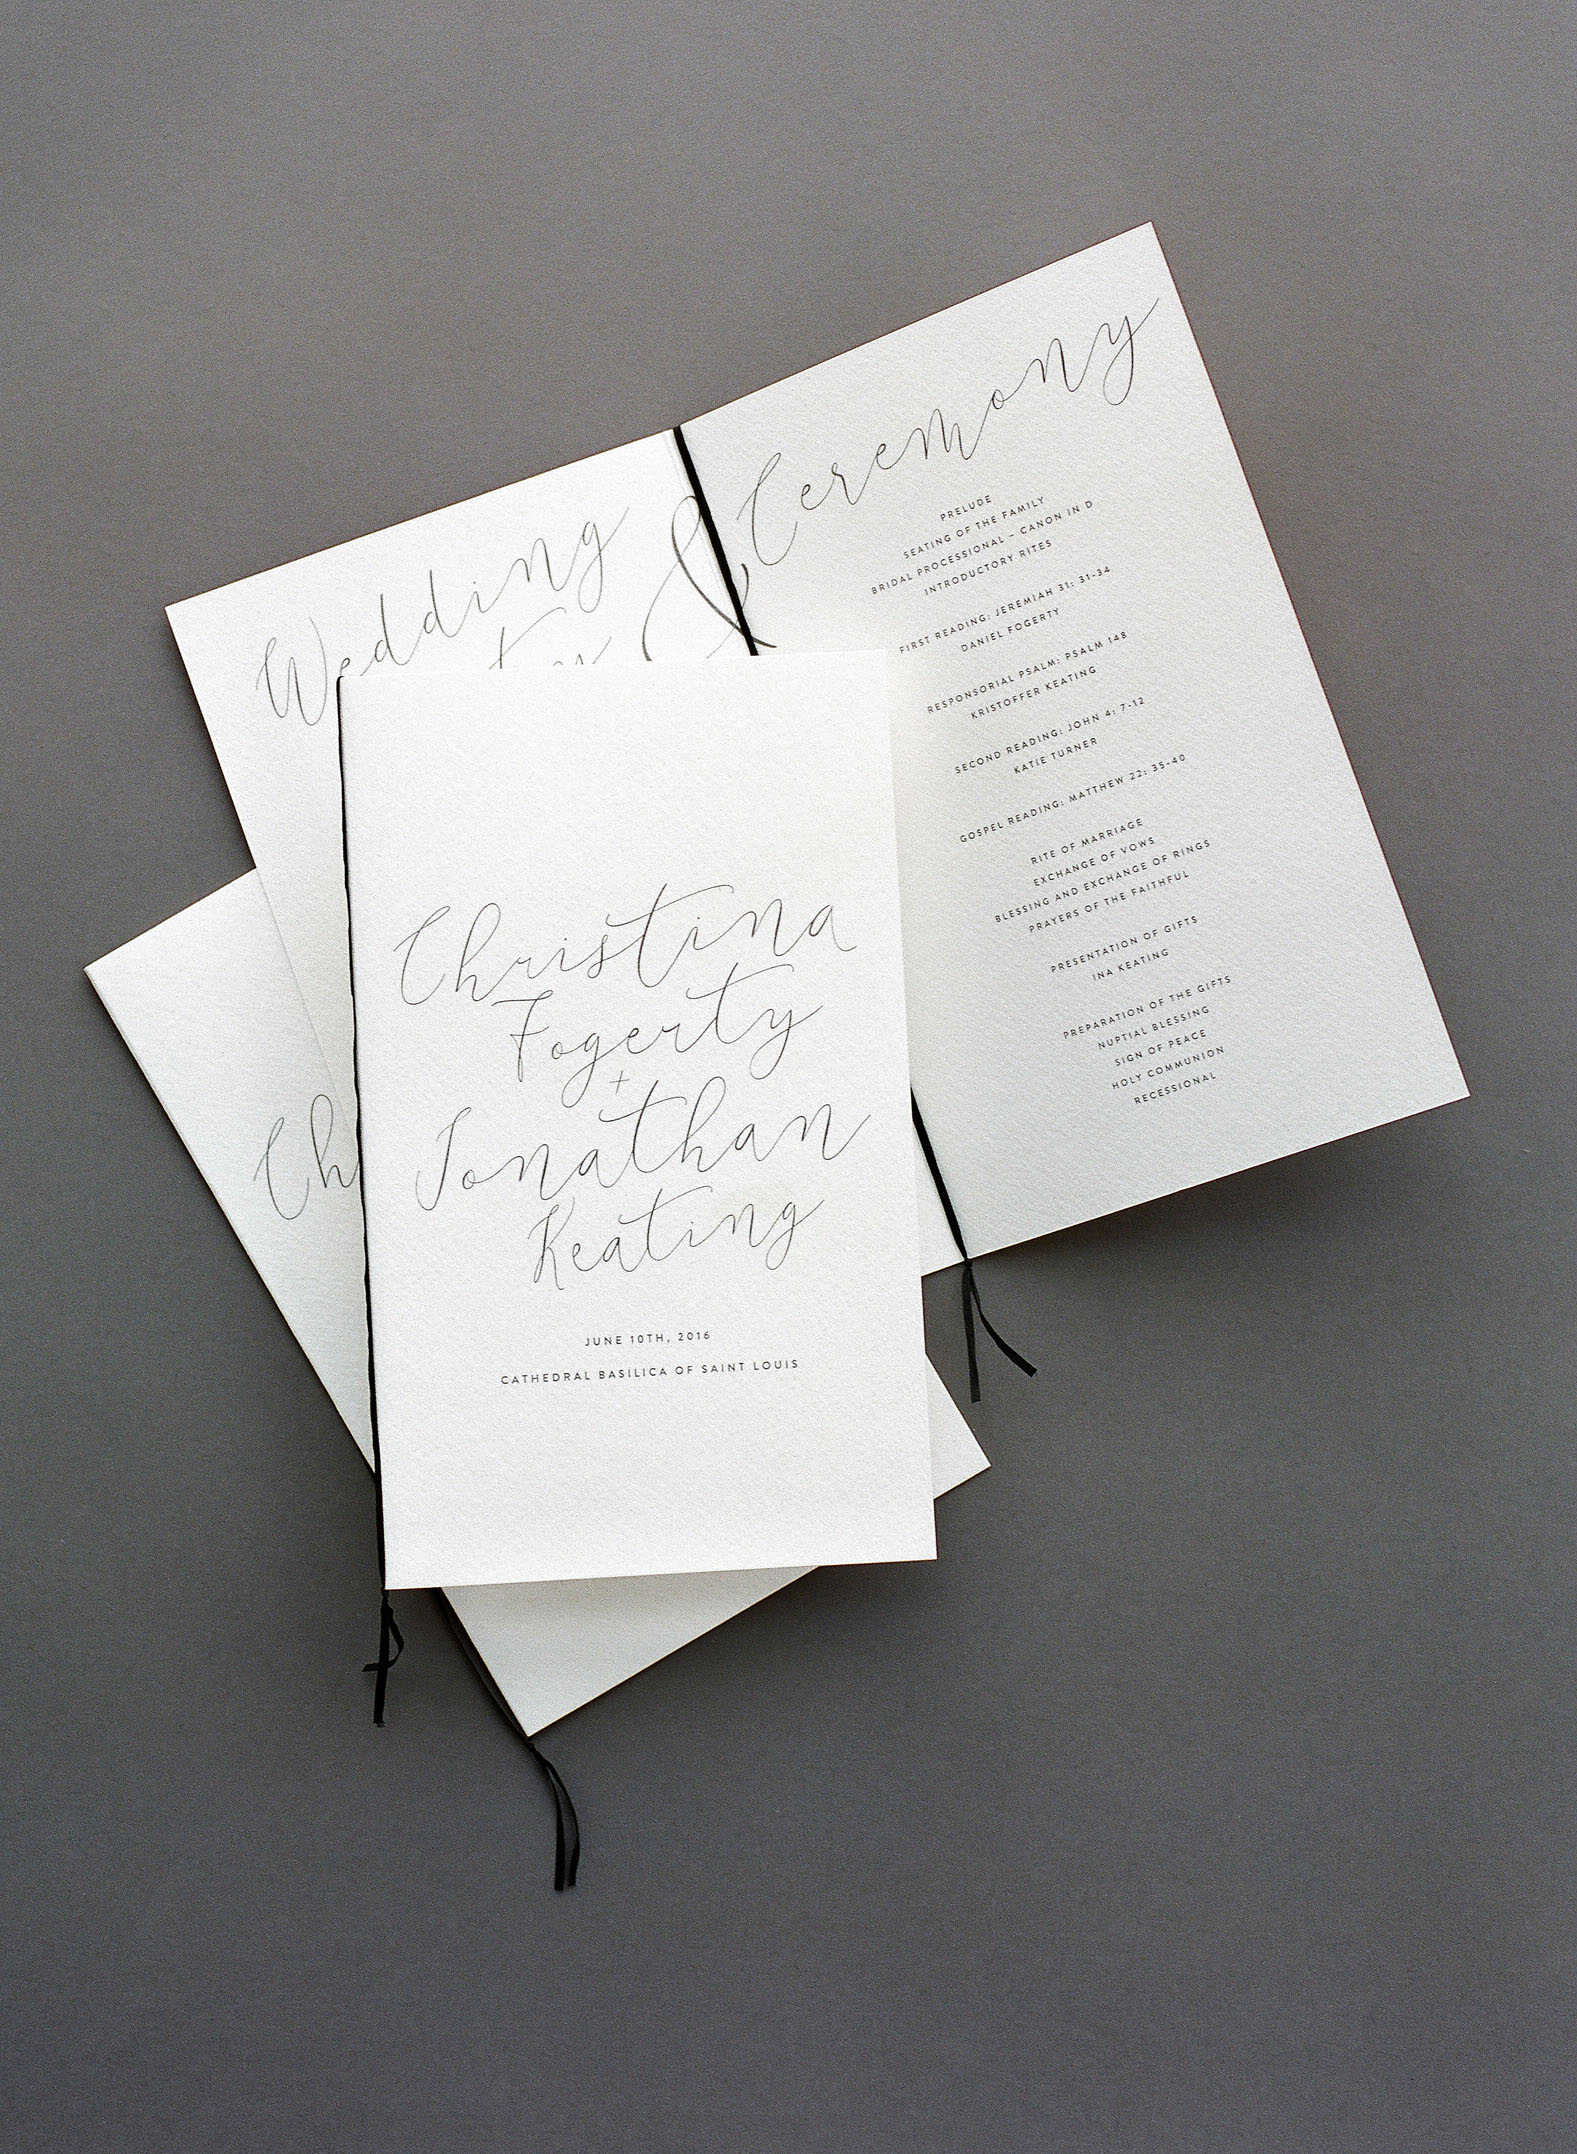 wedding program detail